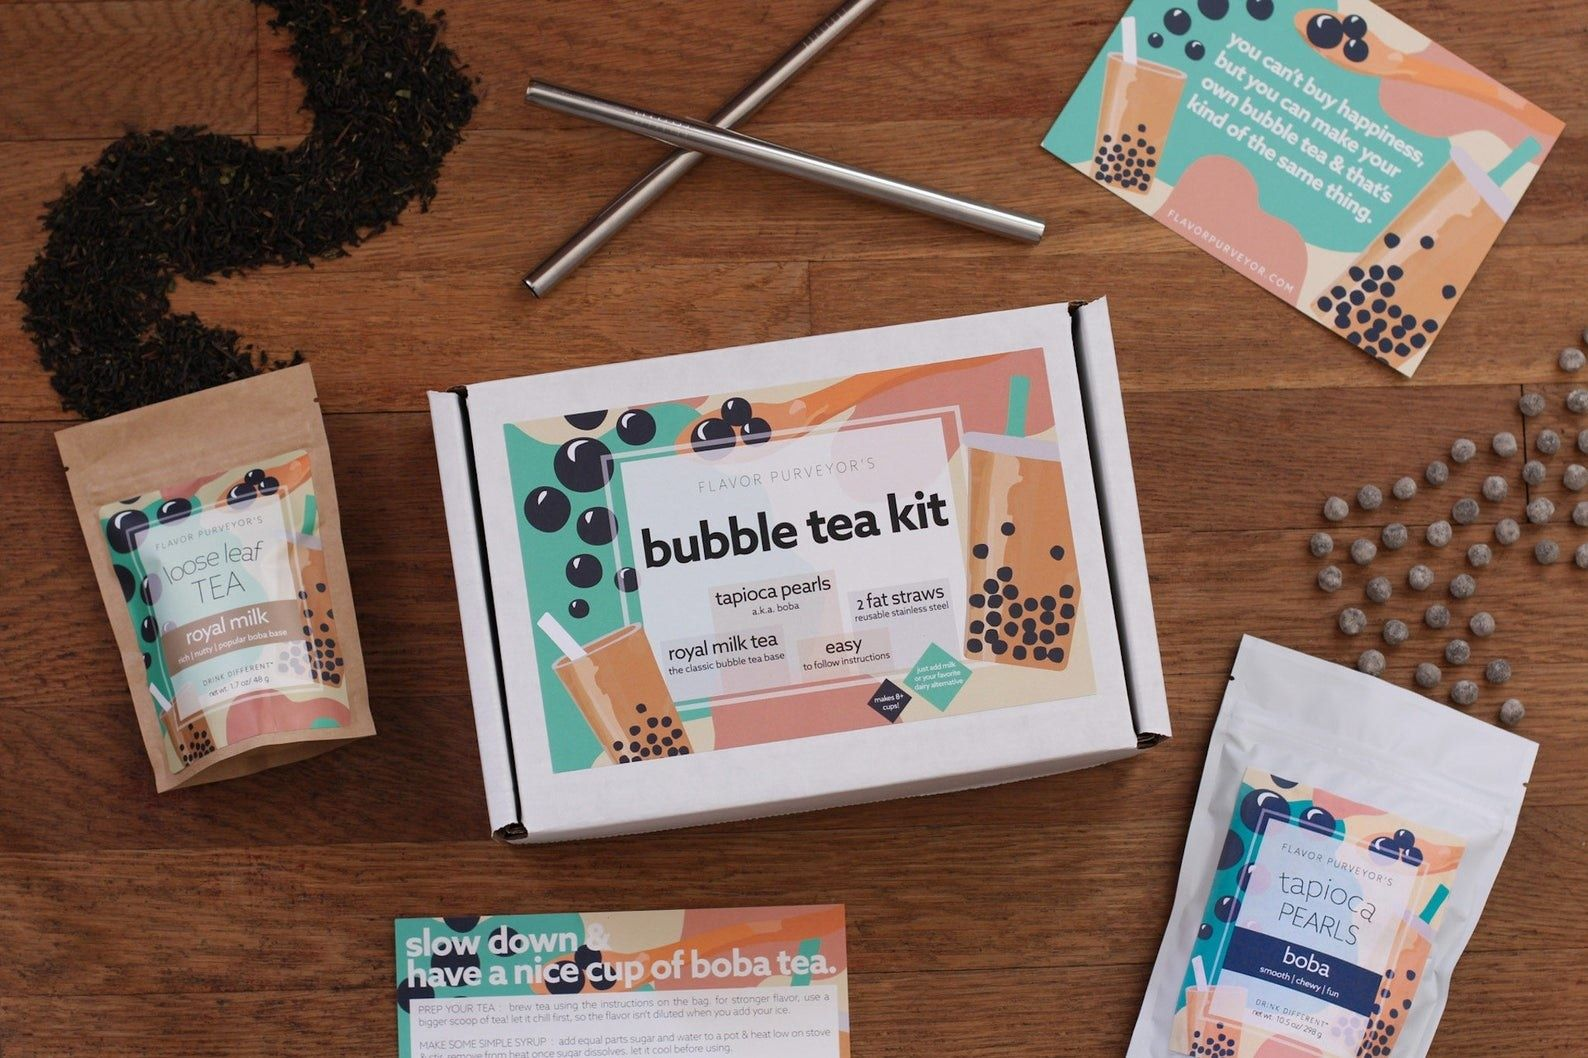 diy boba milk tea kit